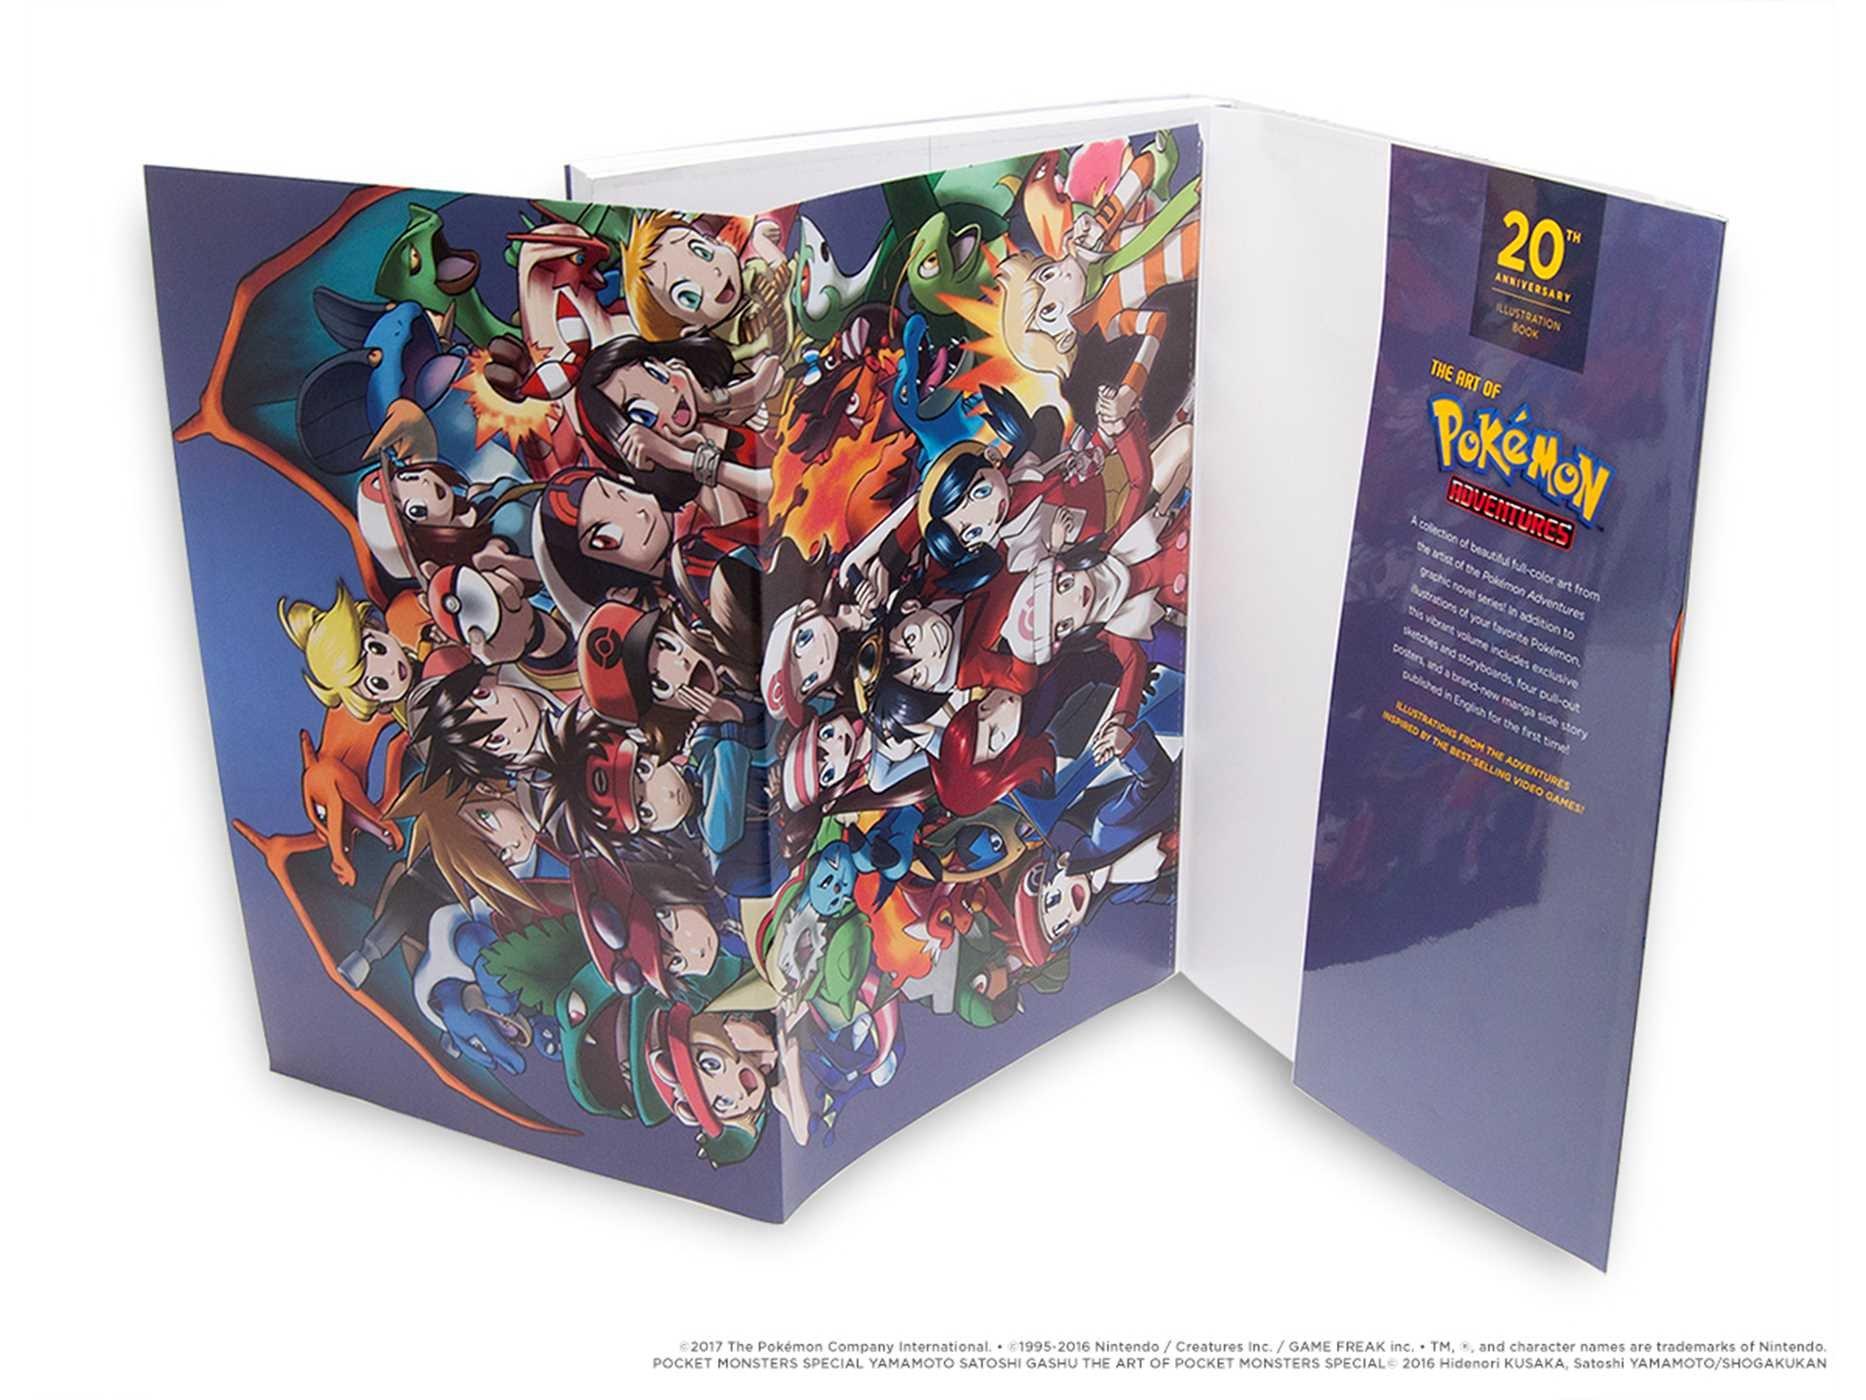 Pokémon Adventures 20th Anniversary Illustration Book: The Art of Pokémon Adventures (Pokemon) by VIZ (Image #5)